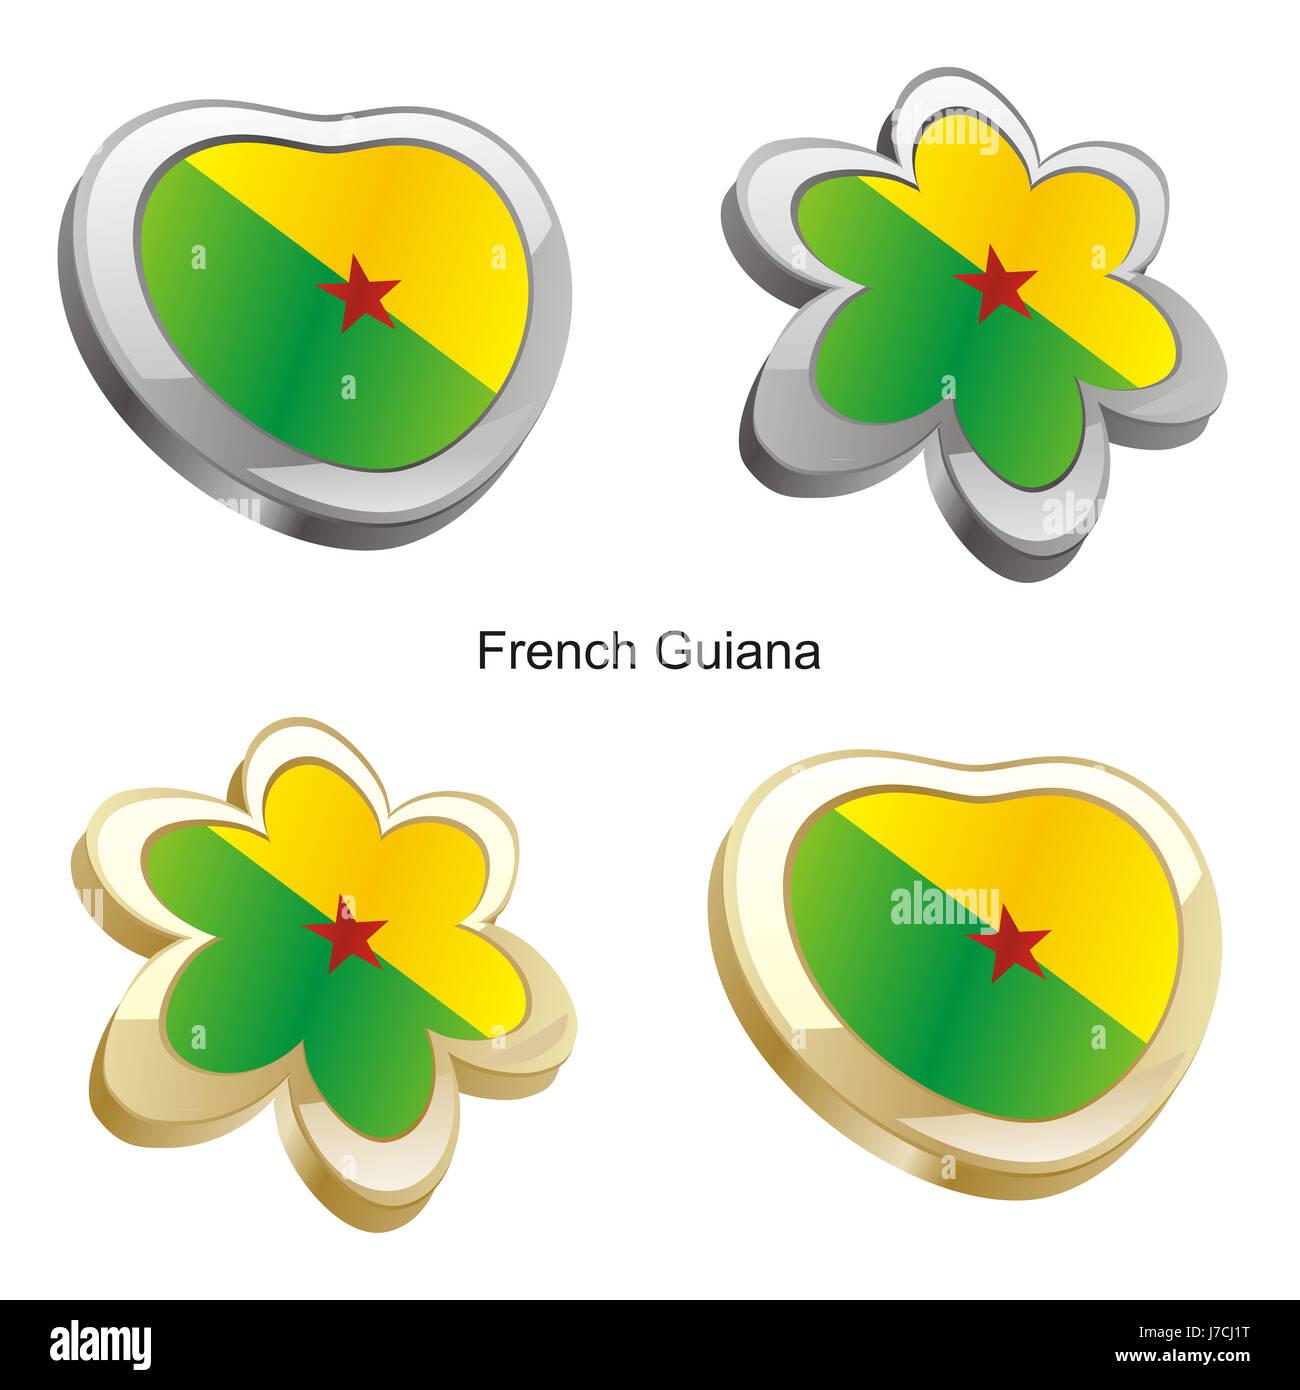 flower plant illustration flag french heart travel colour emblem flower plant - Stock Image